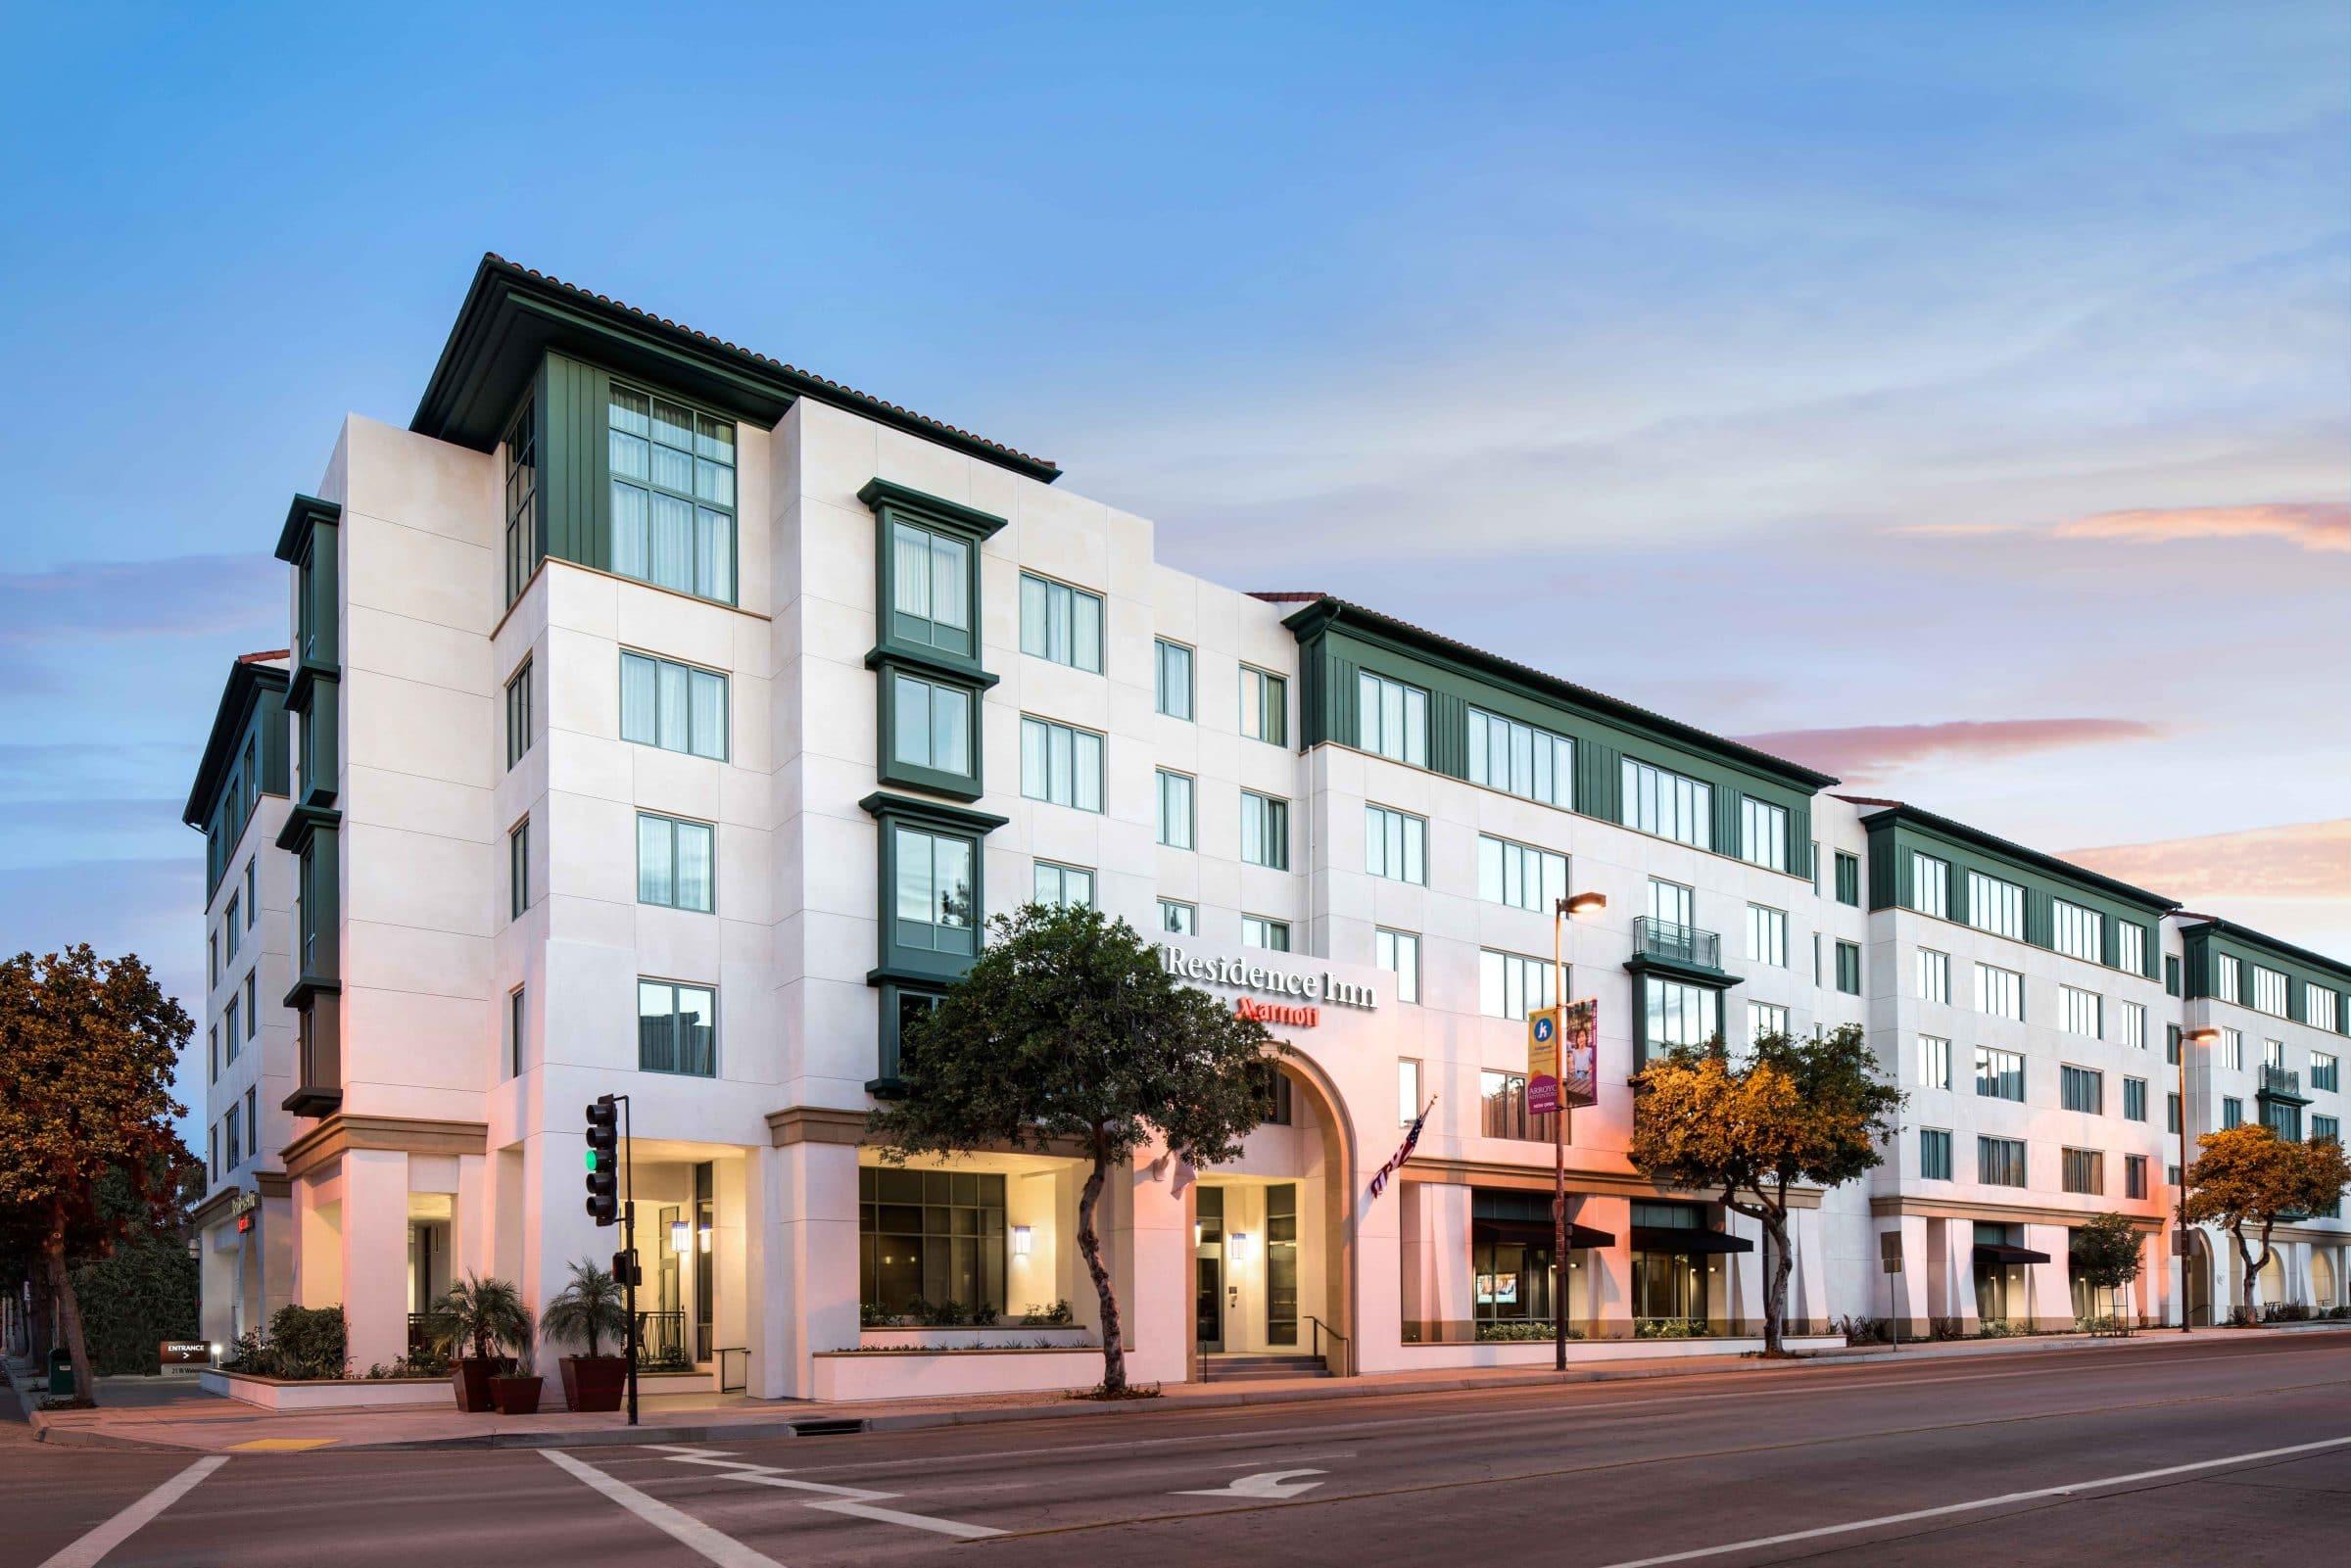 Residence Inn By Marriott Pasadena Old Town R D Olson Development